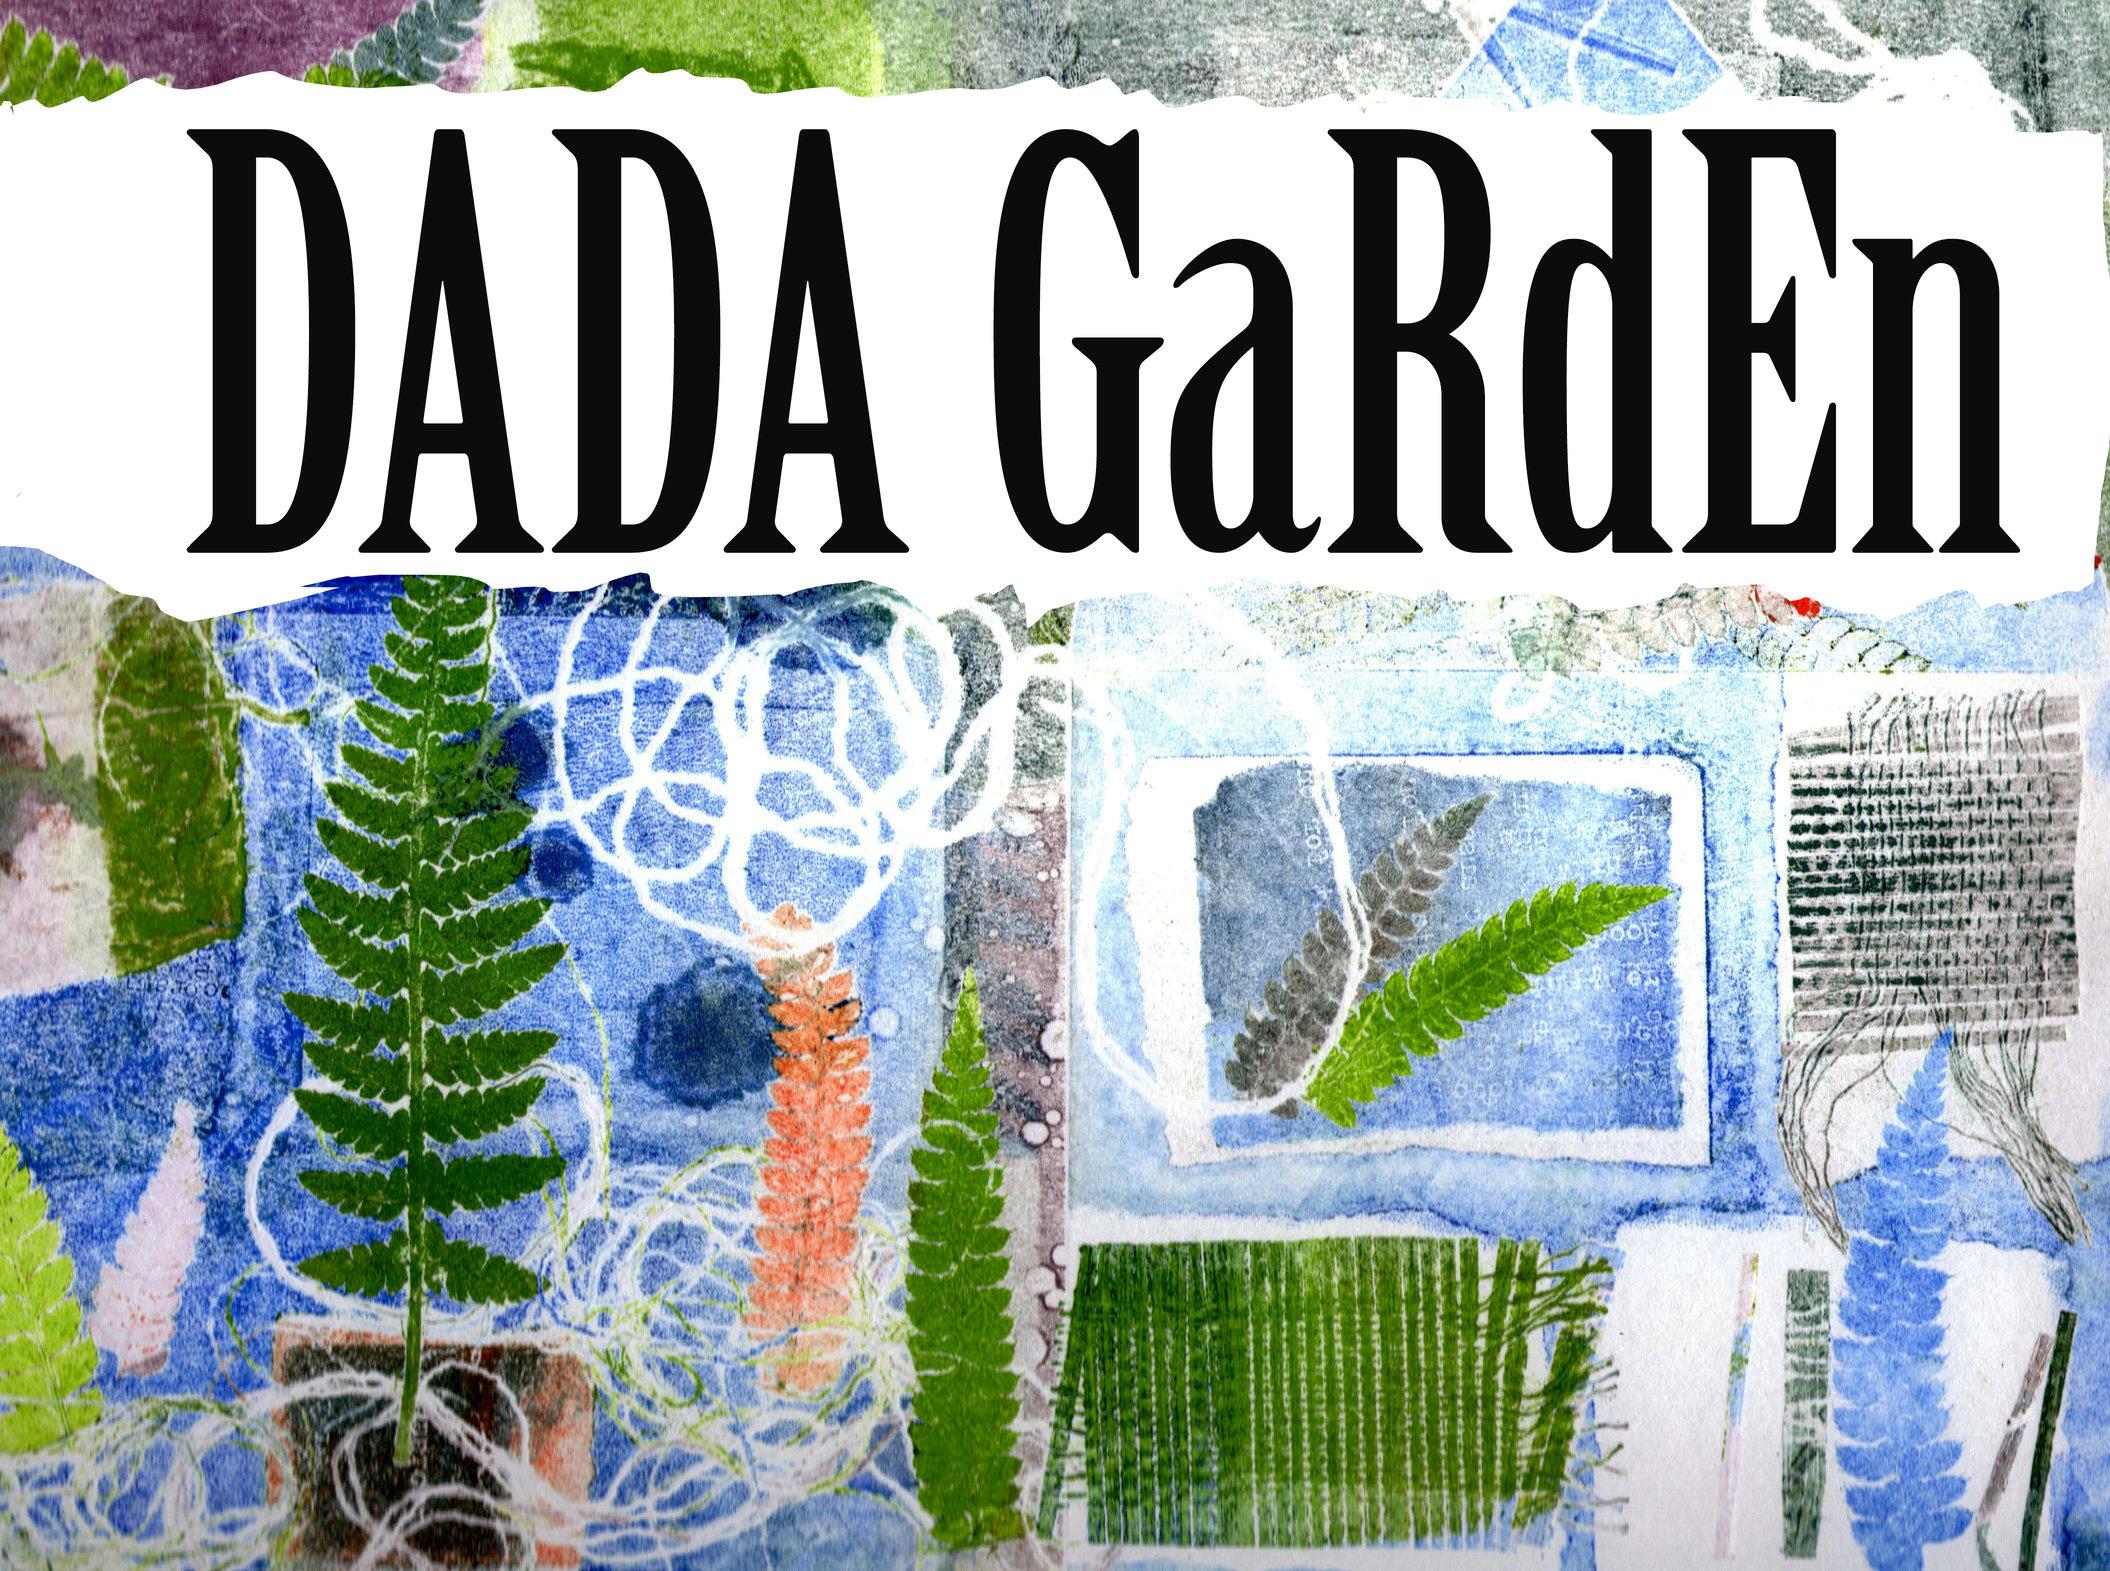 Dada Garden